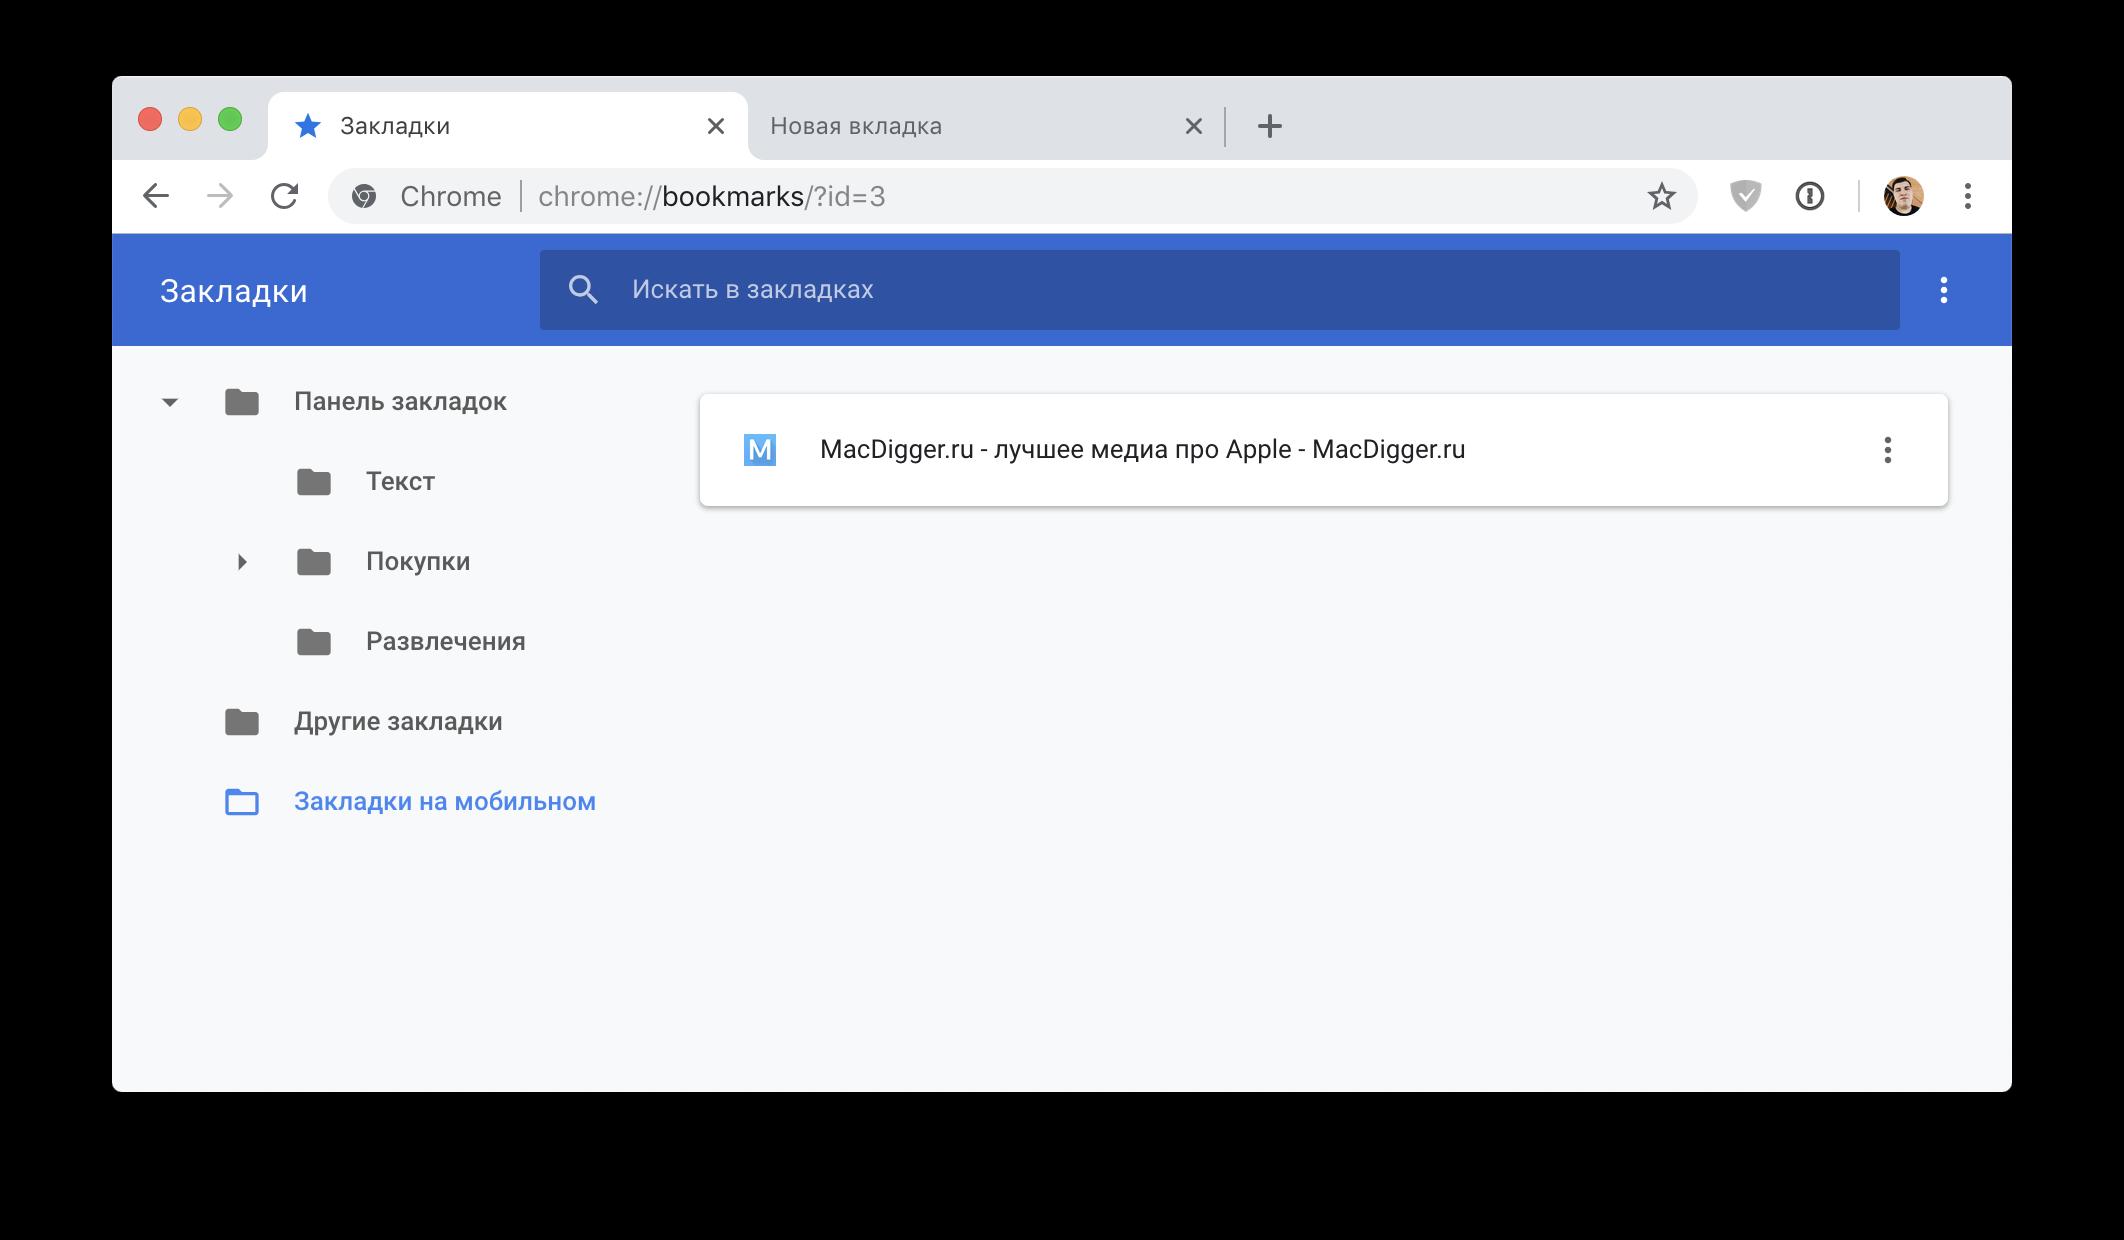 How to add a website to bookmarks Chrome via Safari on iOS